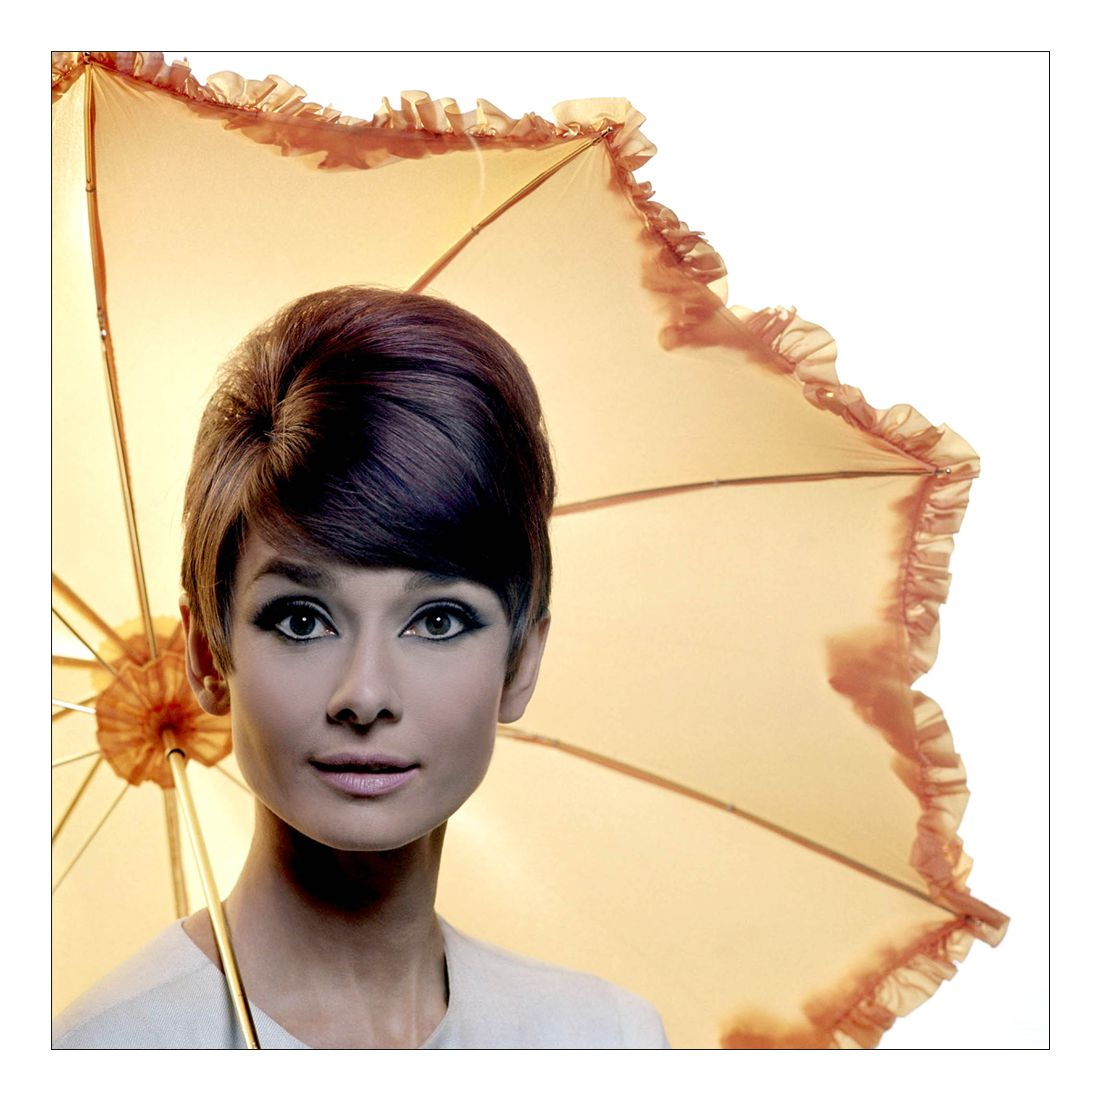 Leinwandbild Audrey Hepburn – 80 x 80cm, Gallery of Innovative Art günstig bestellen